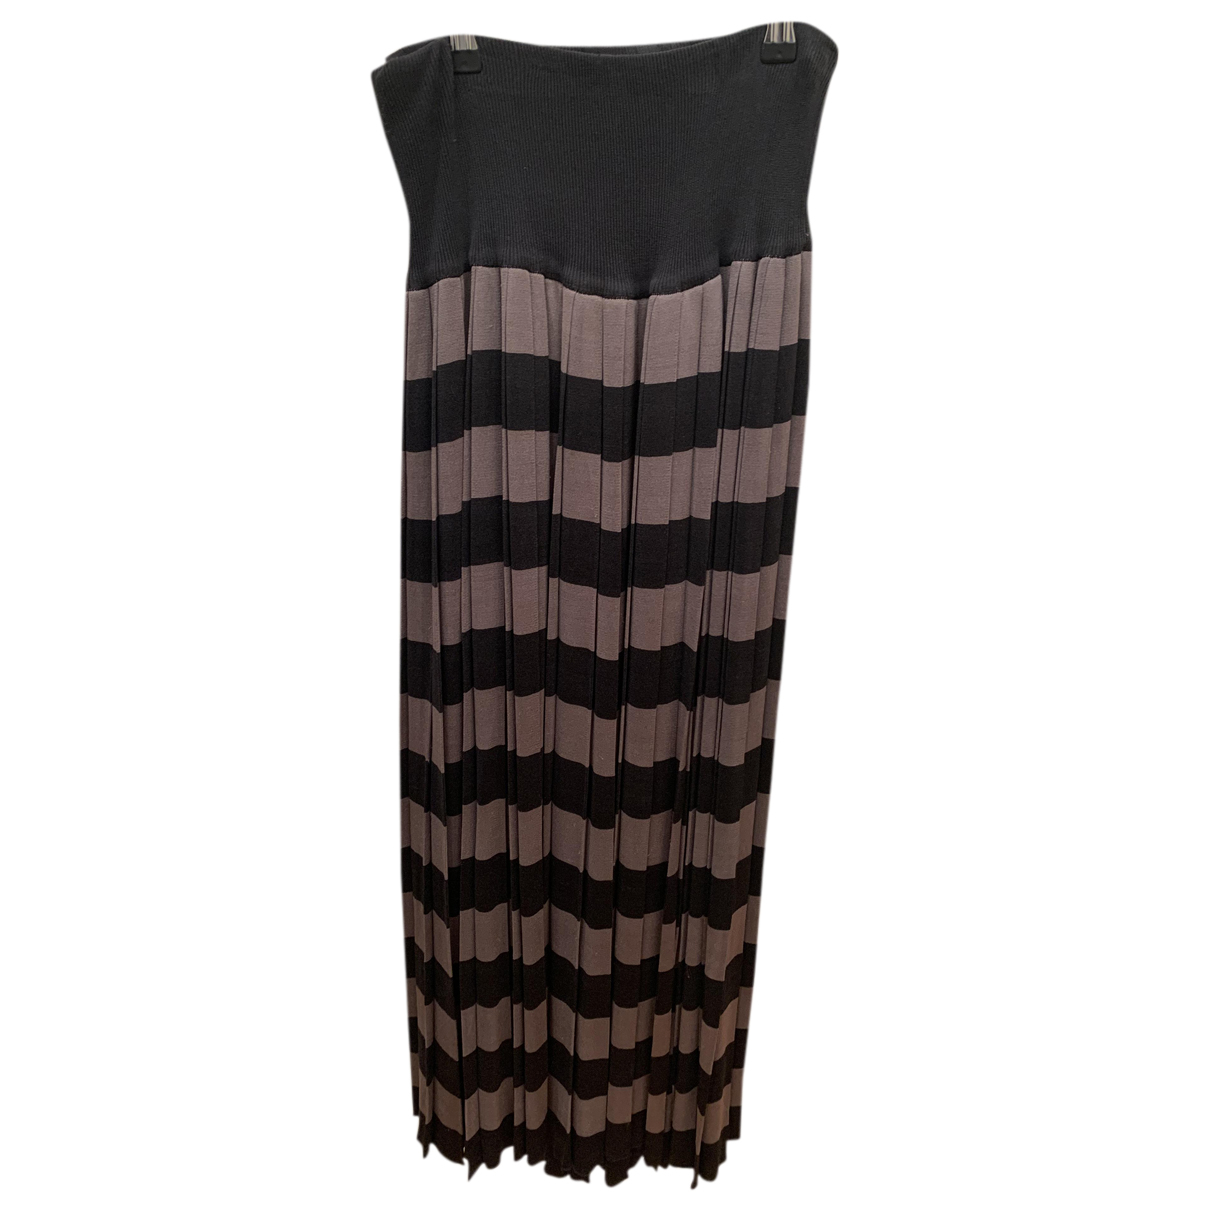 Issey Miyake - Jupe   pour femme en soie - noir